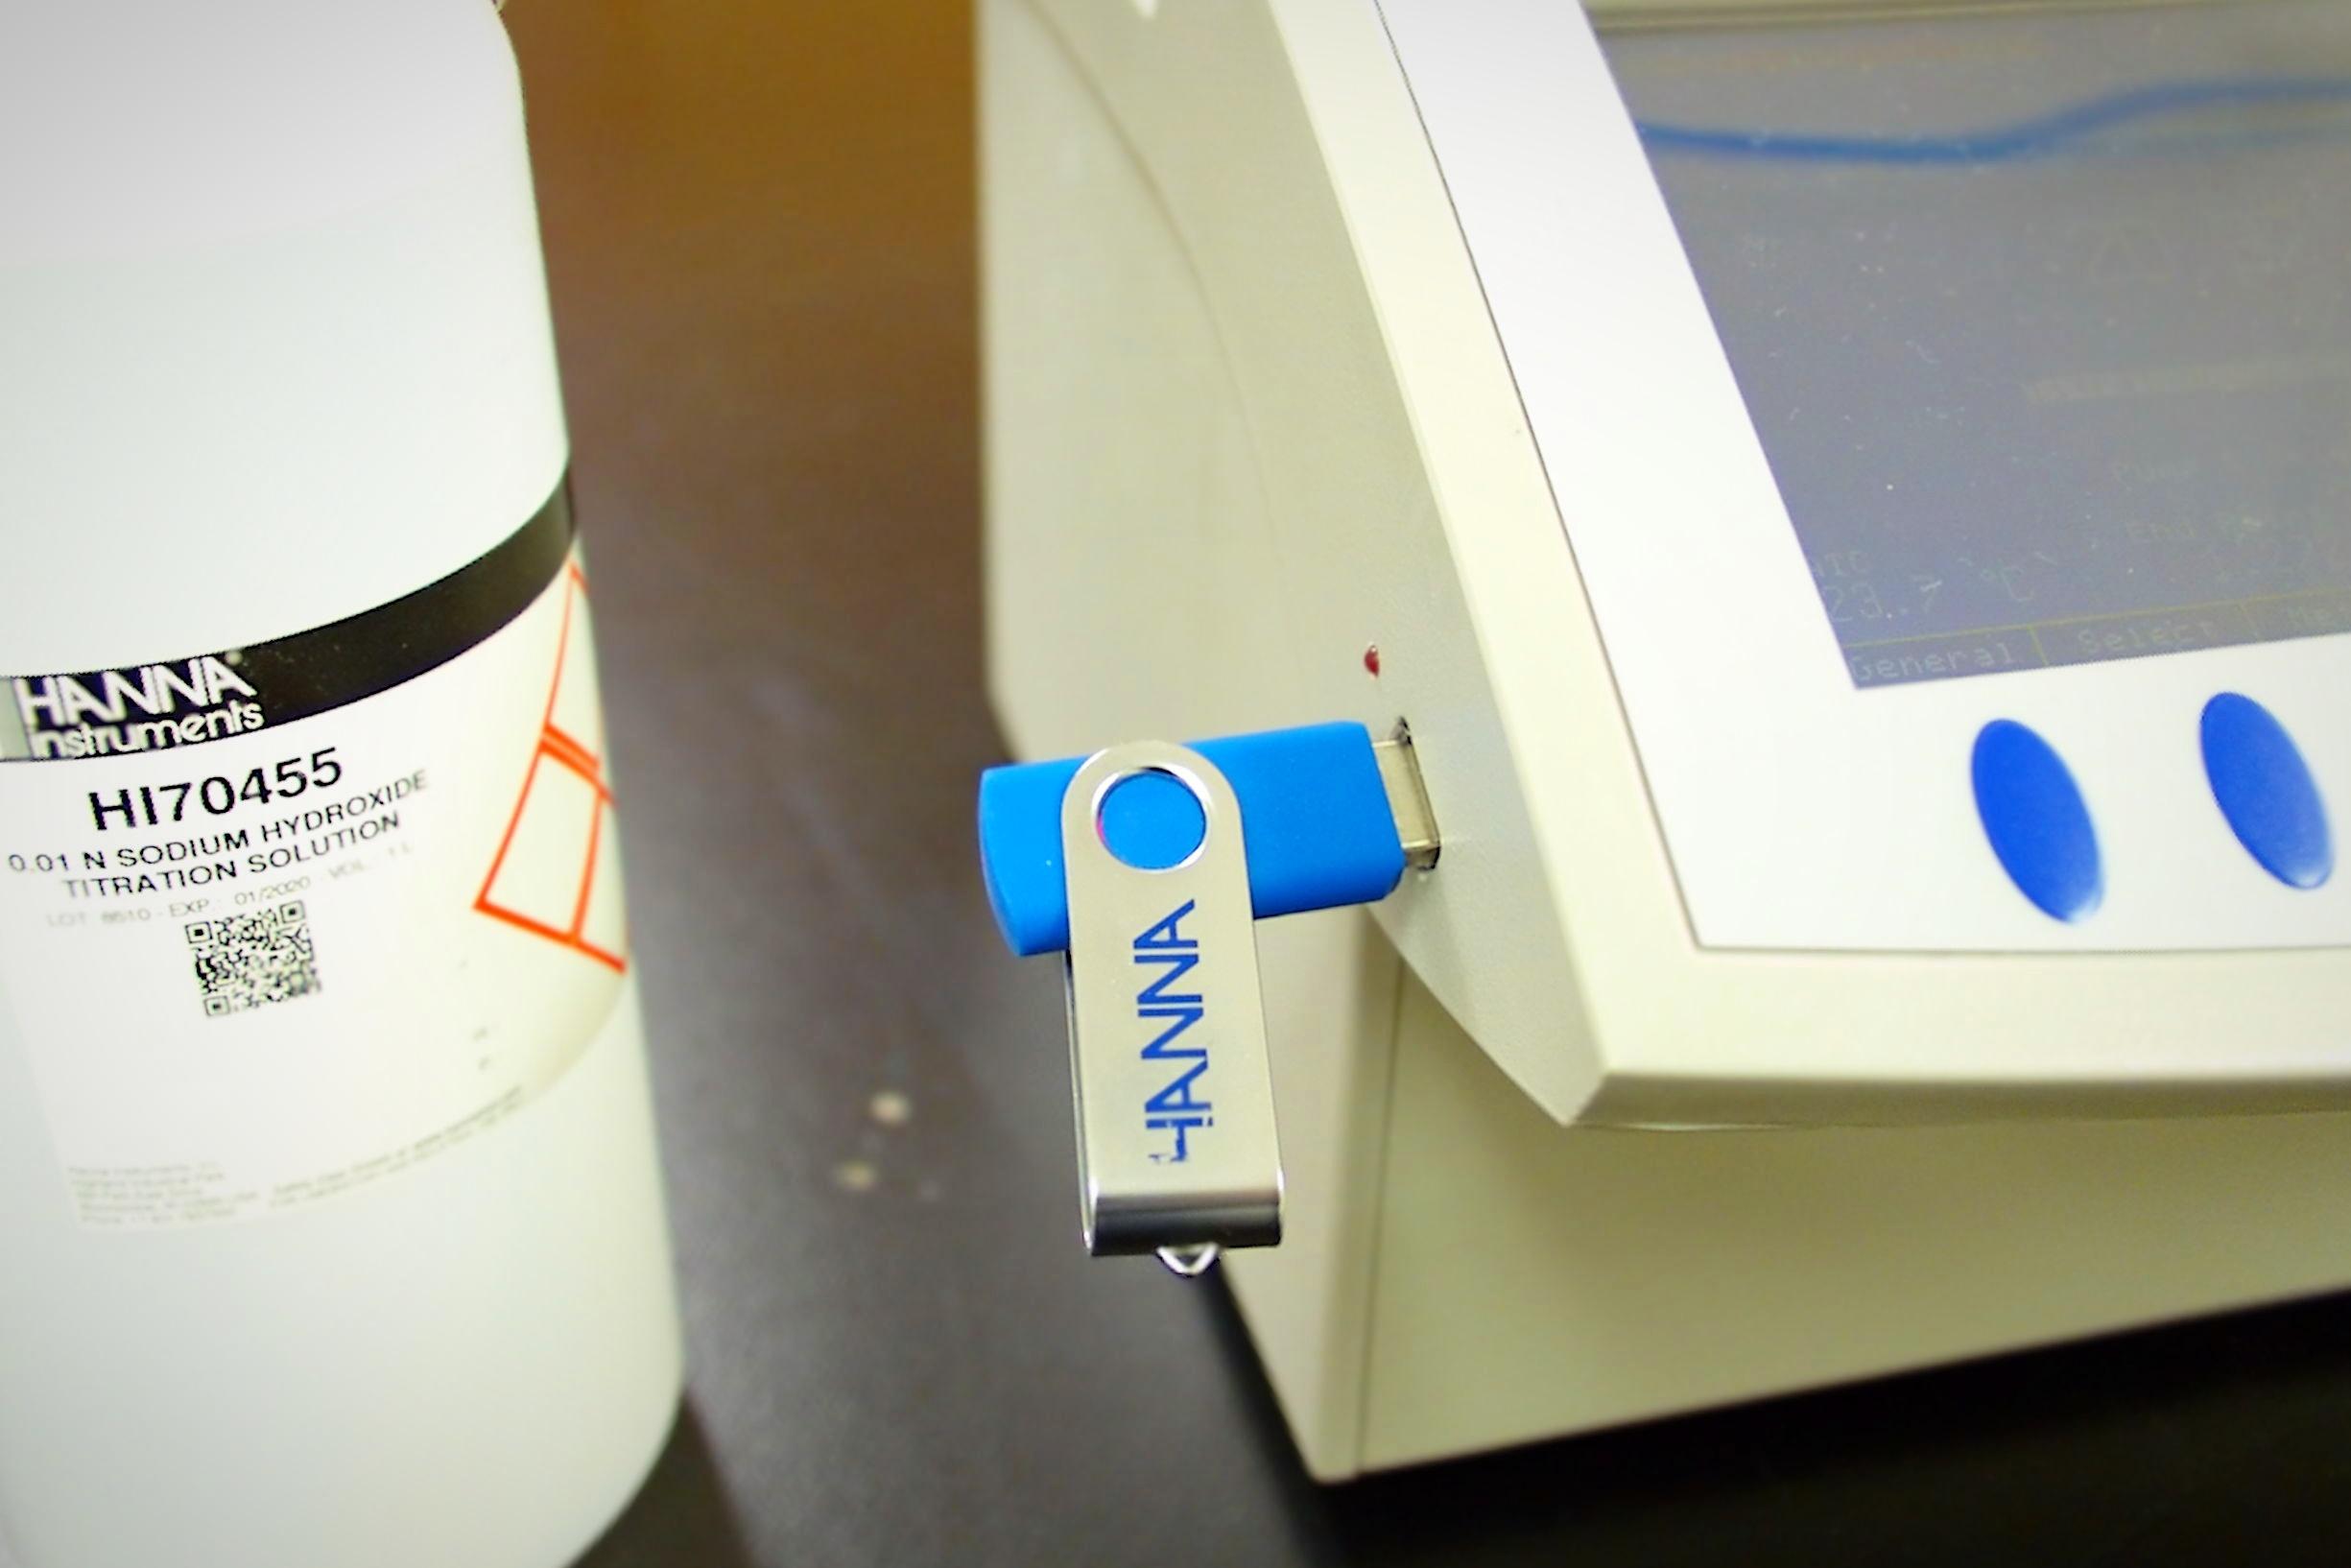 Titrator USB port